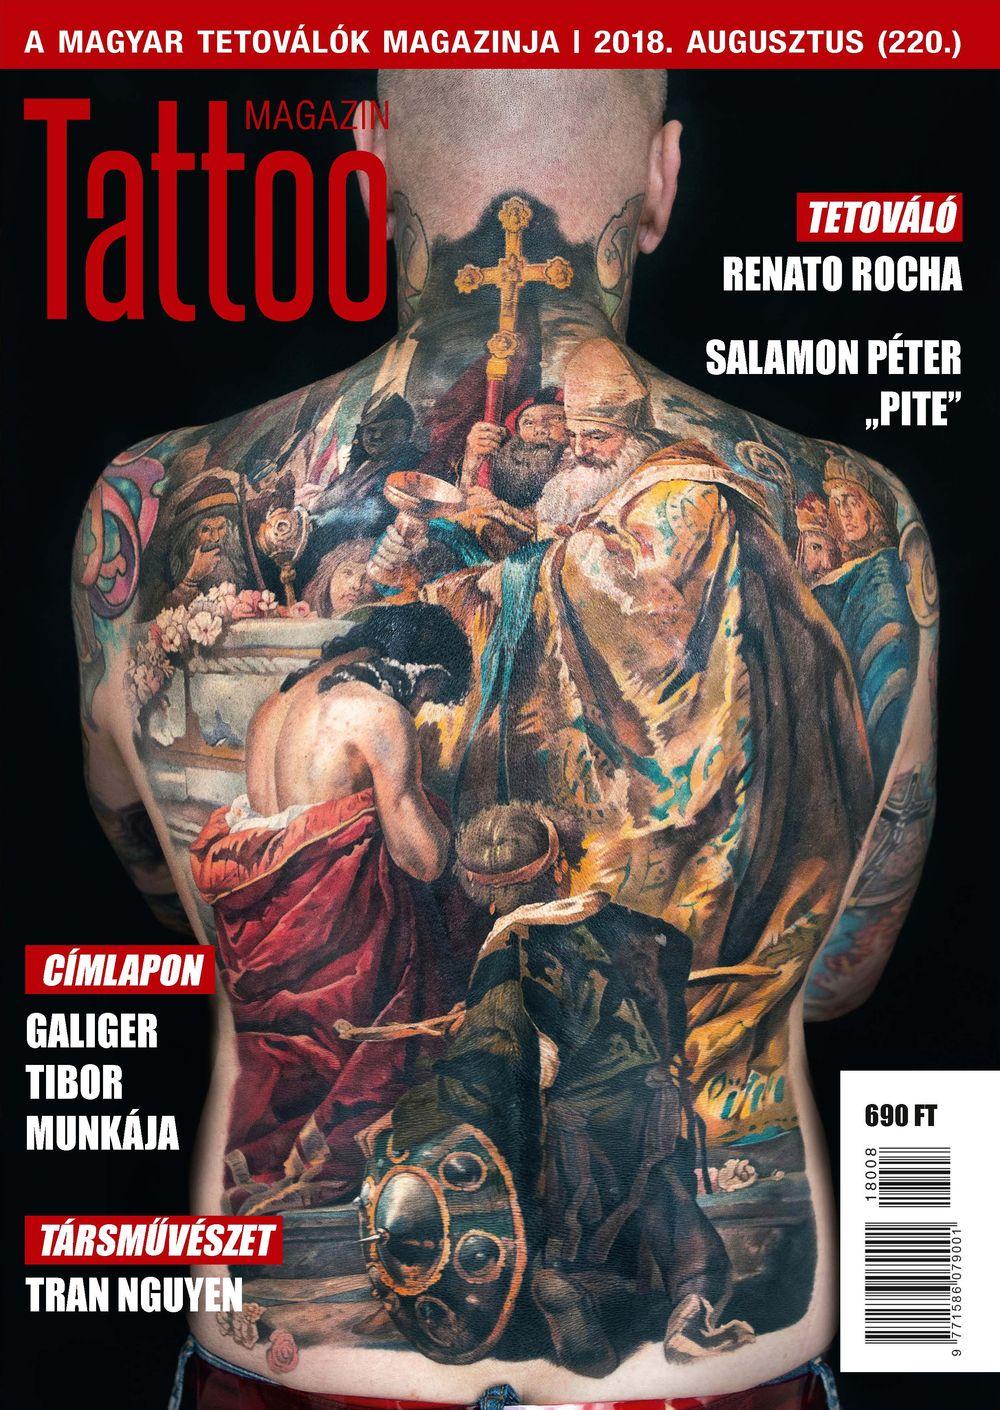 Tattoo 2018 Augusztus (220.)